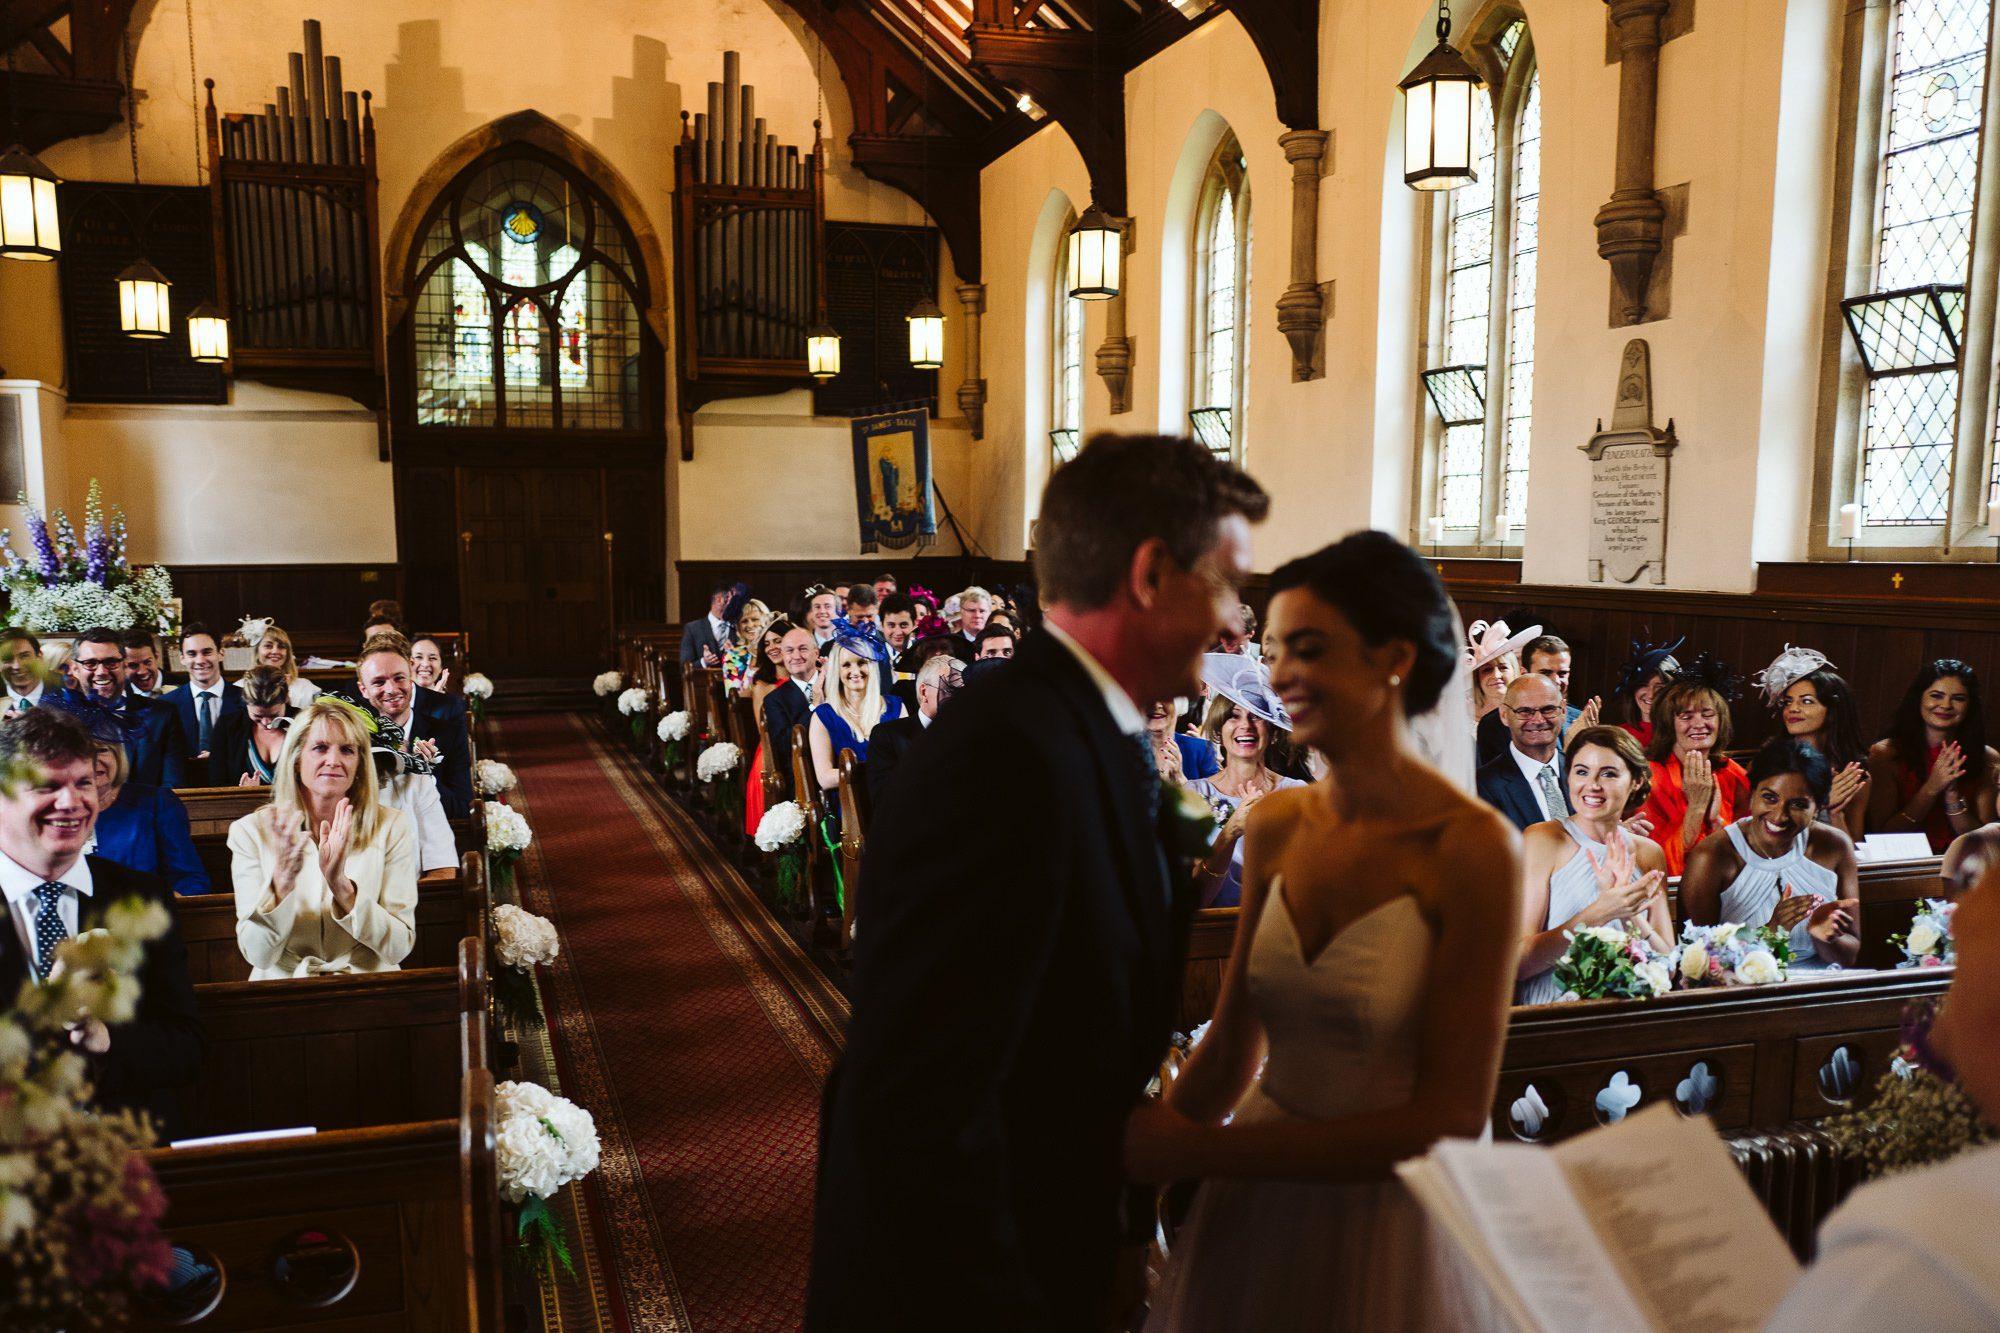 Kettleshulme church wedding